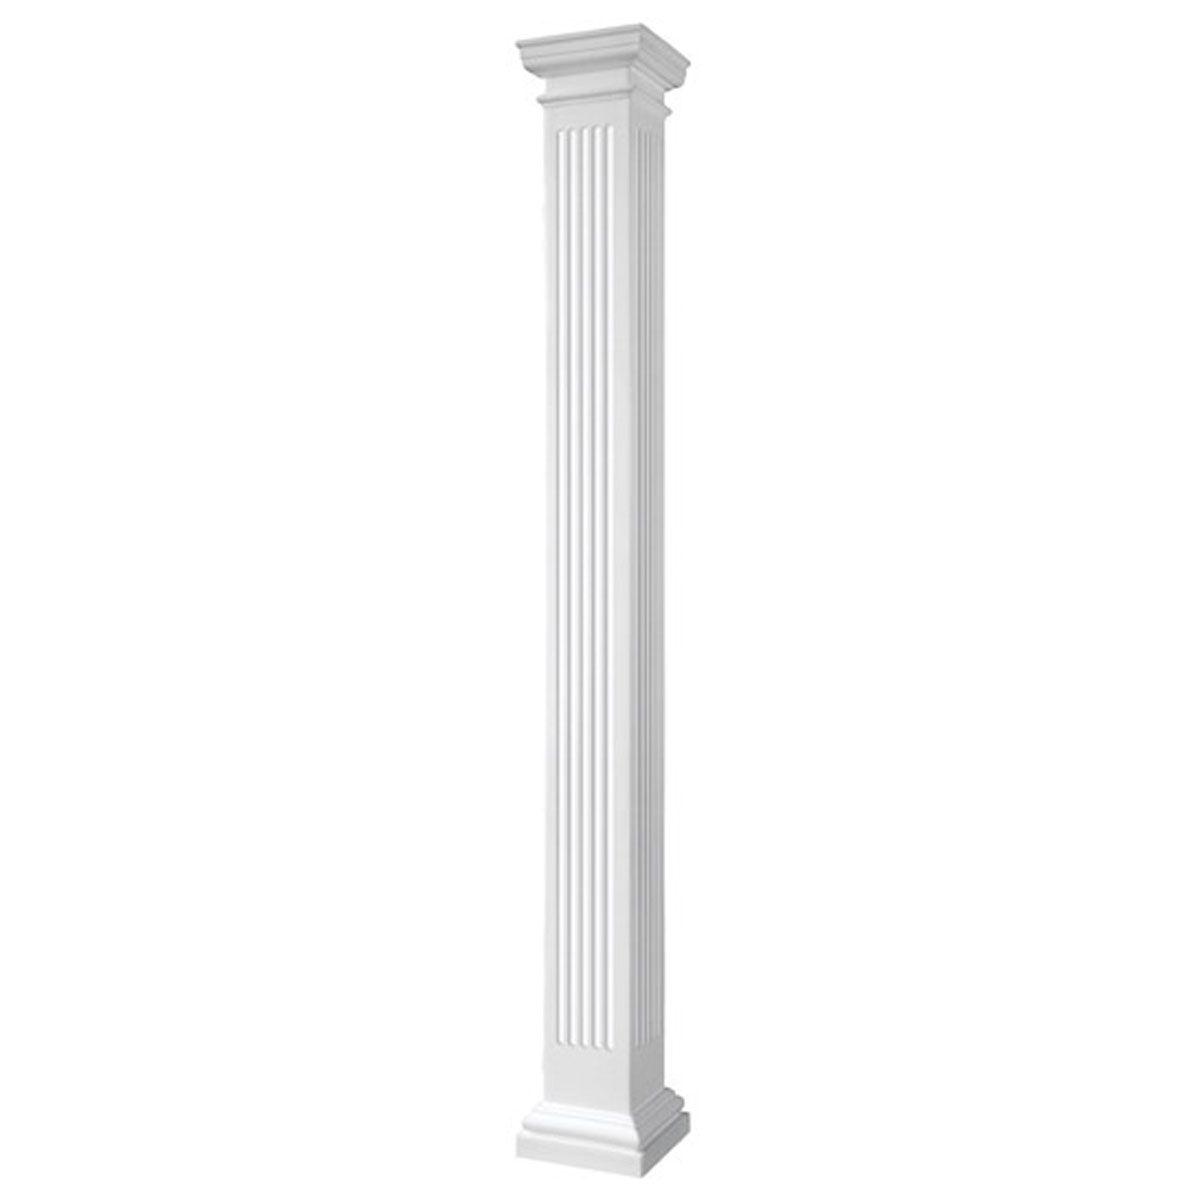 Sqanftutu Jpg 1 200 215 1 200 Pixels Fluted Columns Square